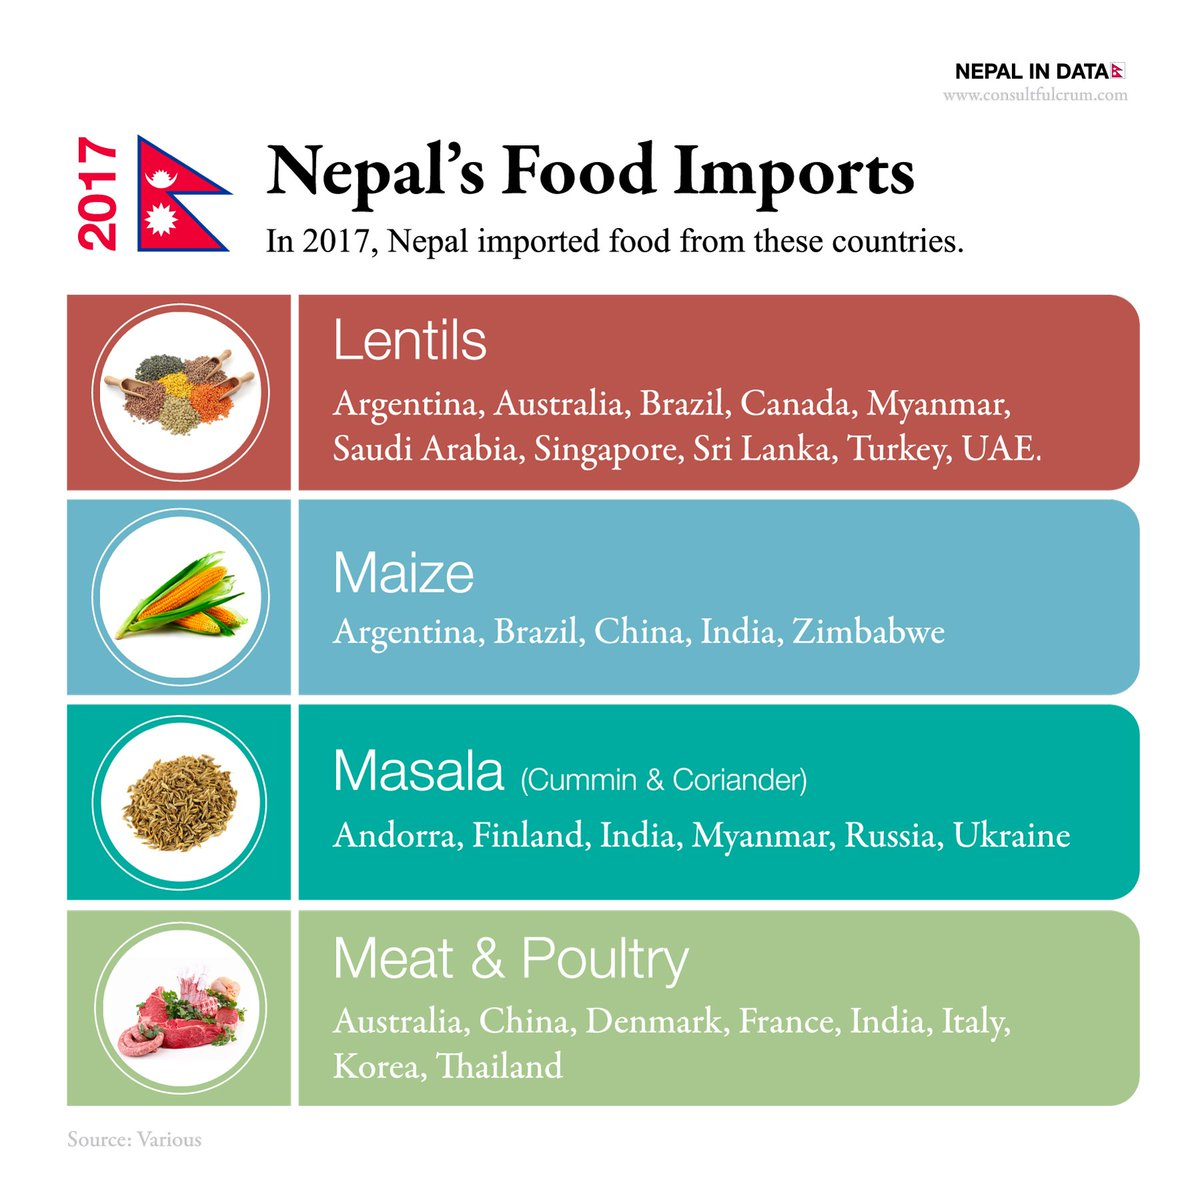 nepaleseeconomy hashtag on Twitter